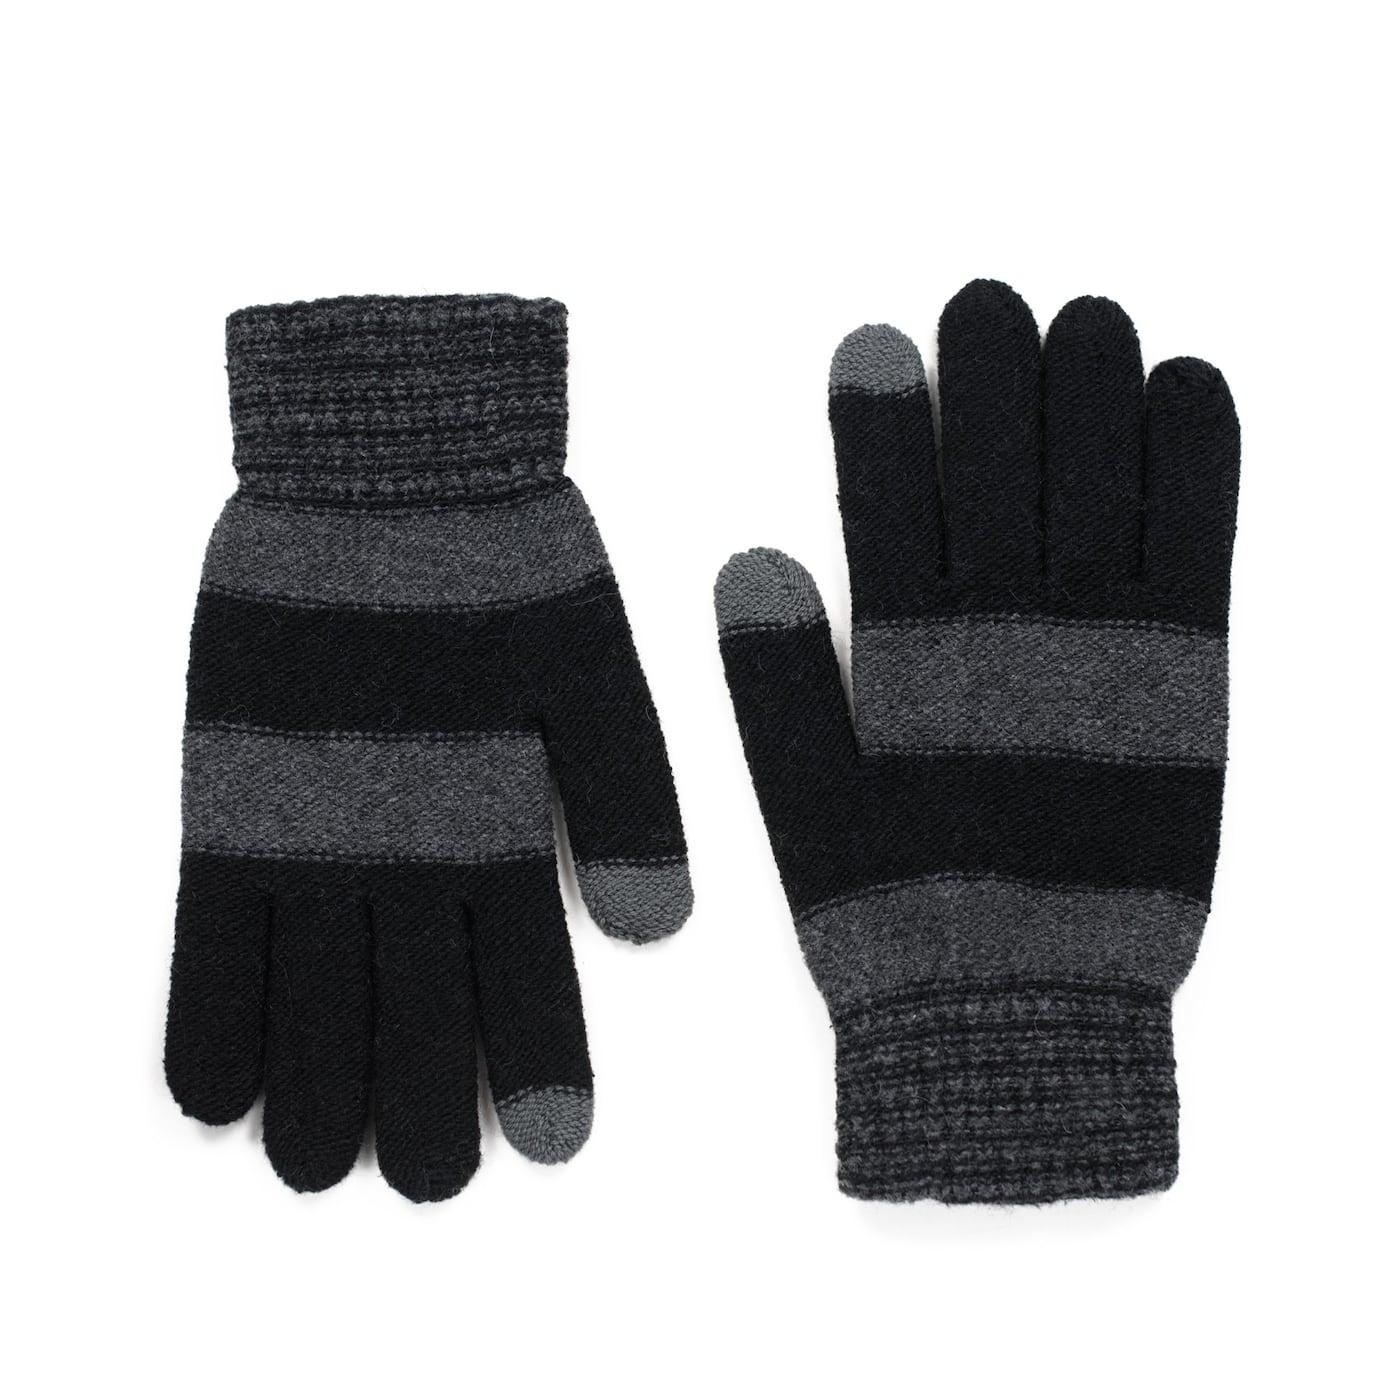 Art Of Polo Man's Gloves rk18403